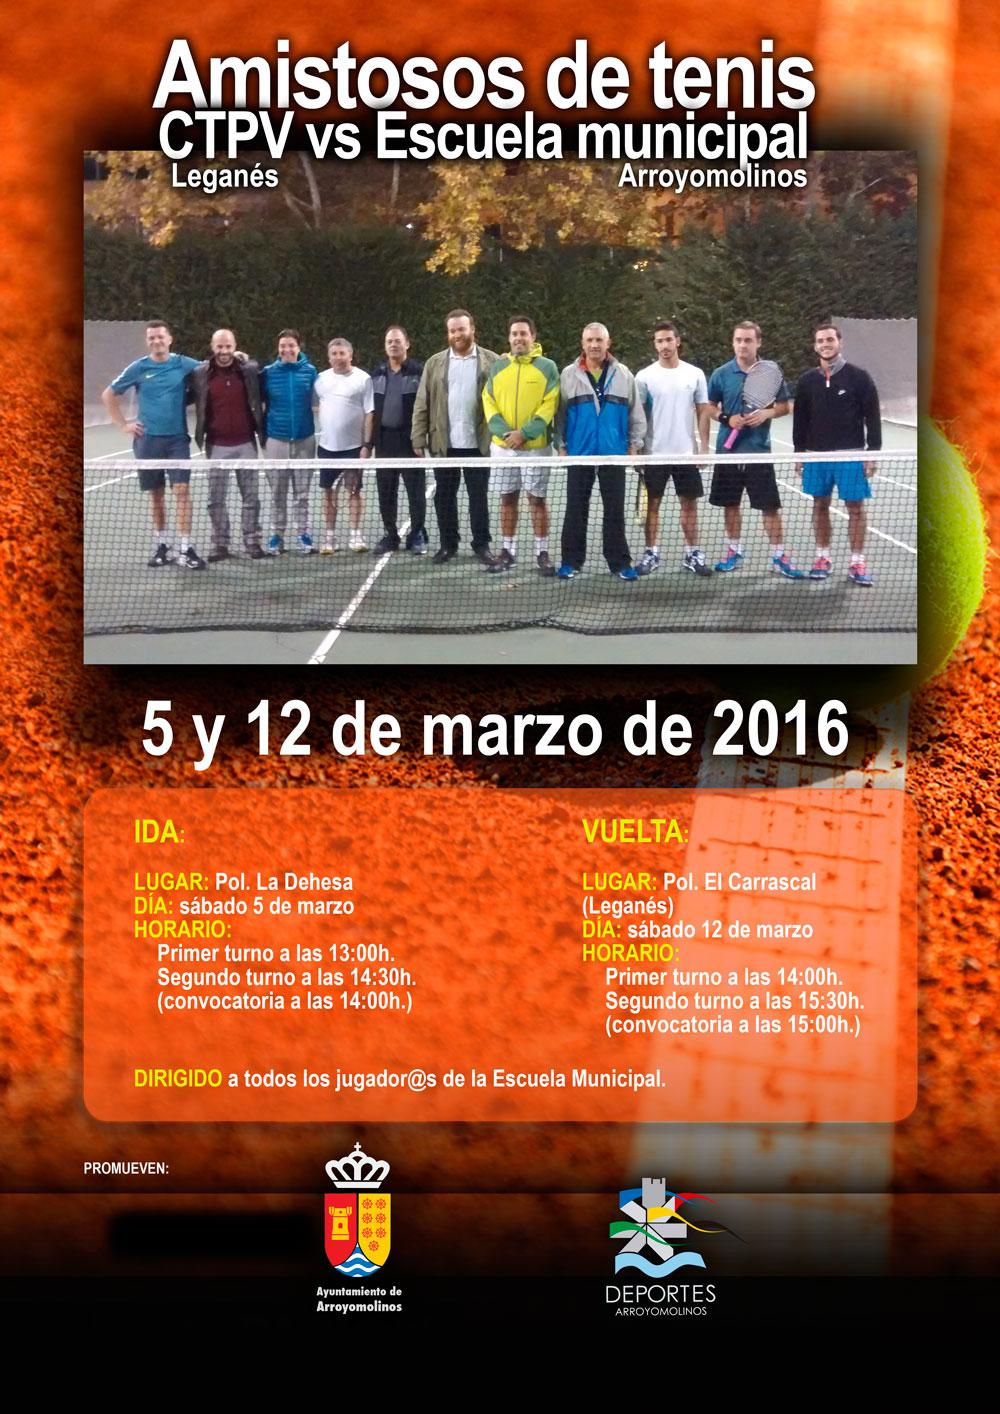 Amistosos tenis CTPV Leganés vs Arroyomolinos